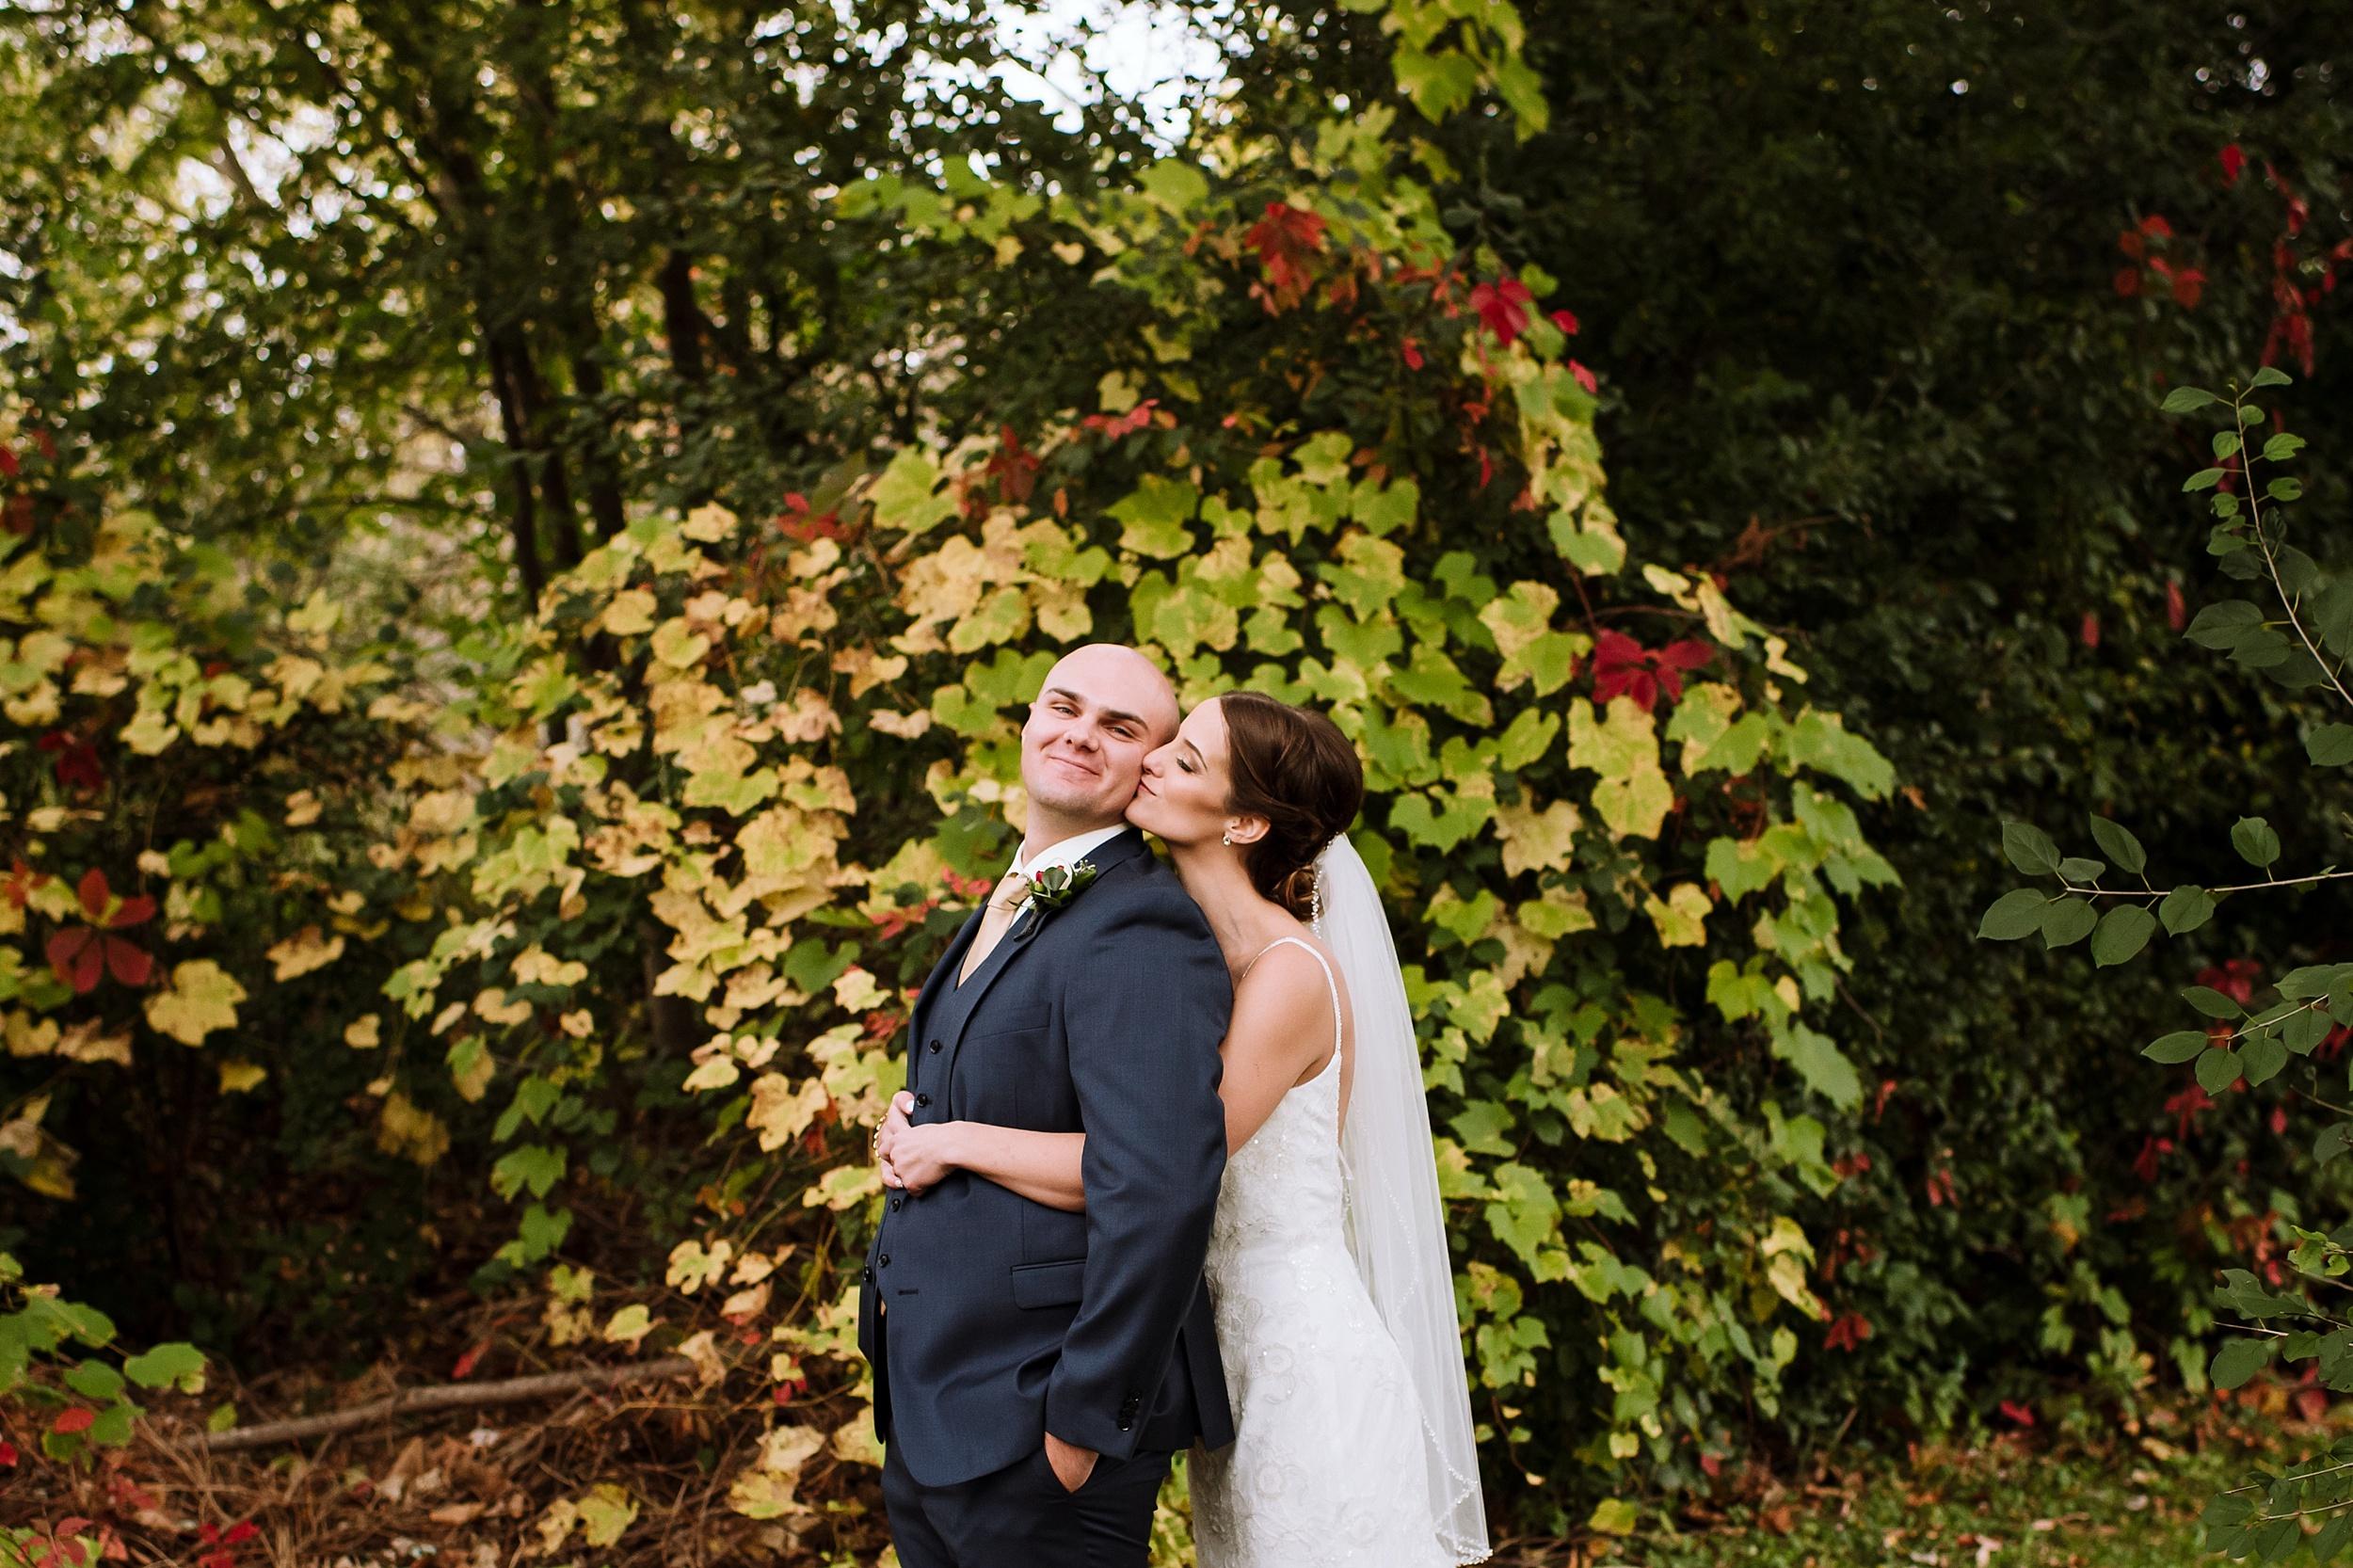 Windemere_Manor_Fall_Wedding_London_Toronto_Wedding_Photographer_0018.jpg